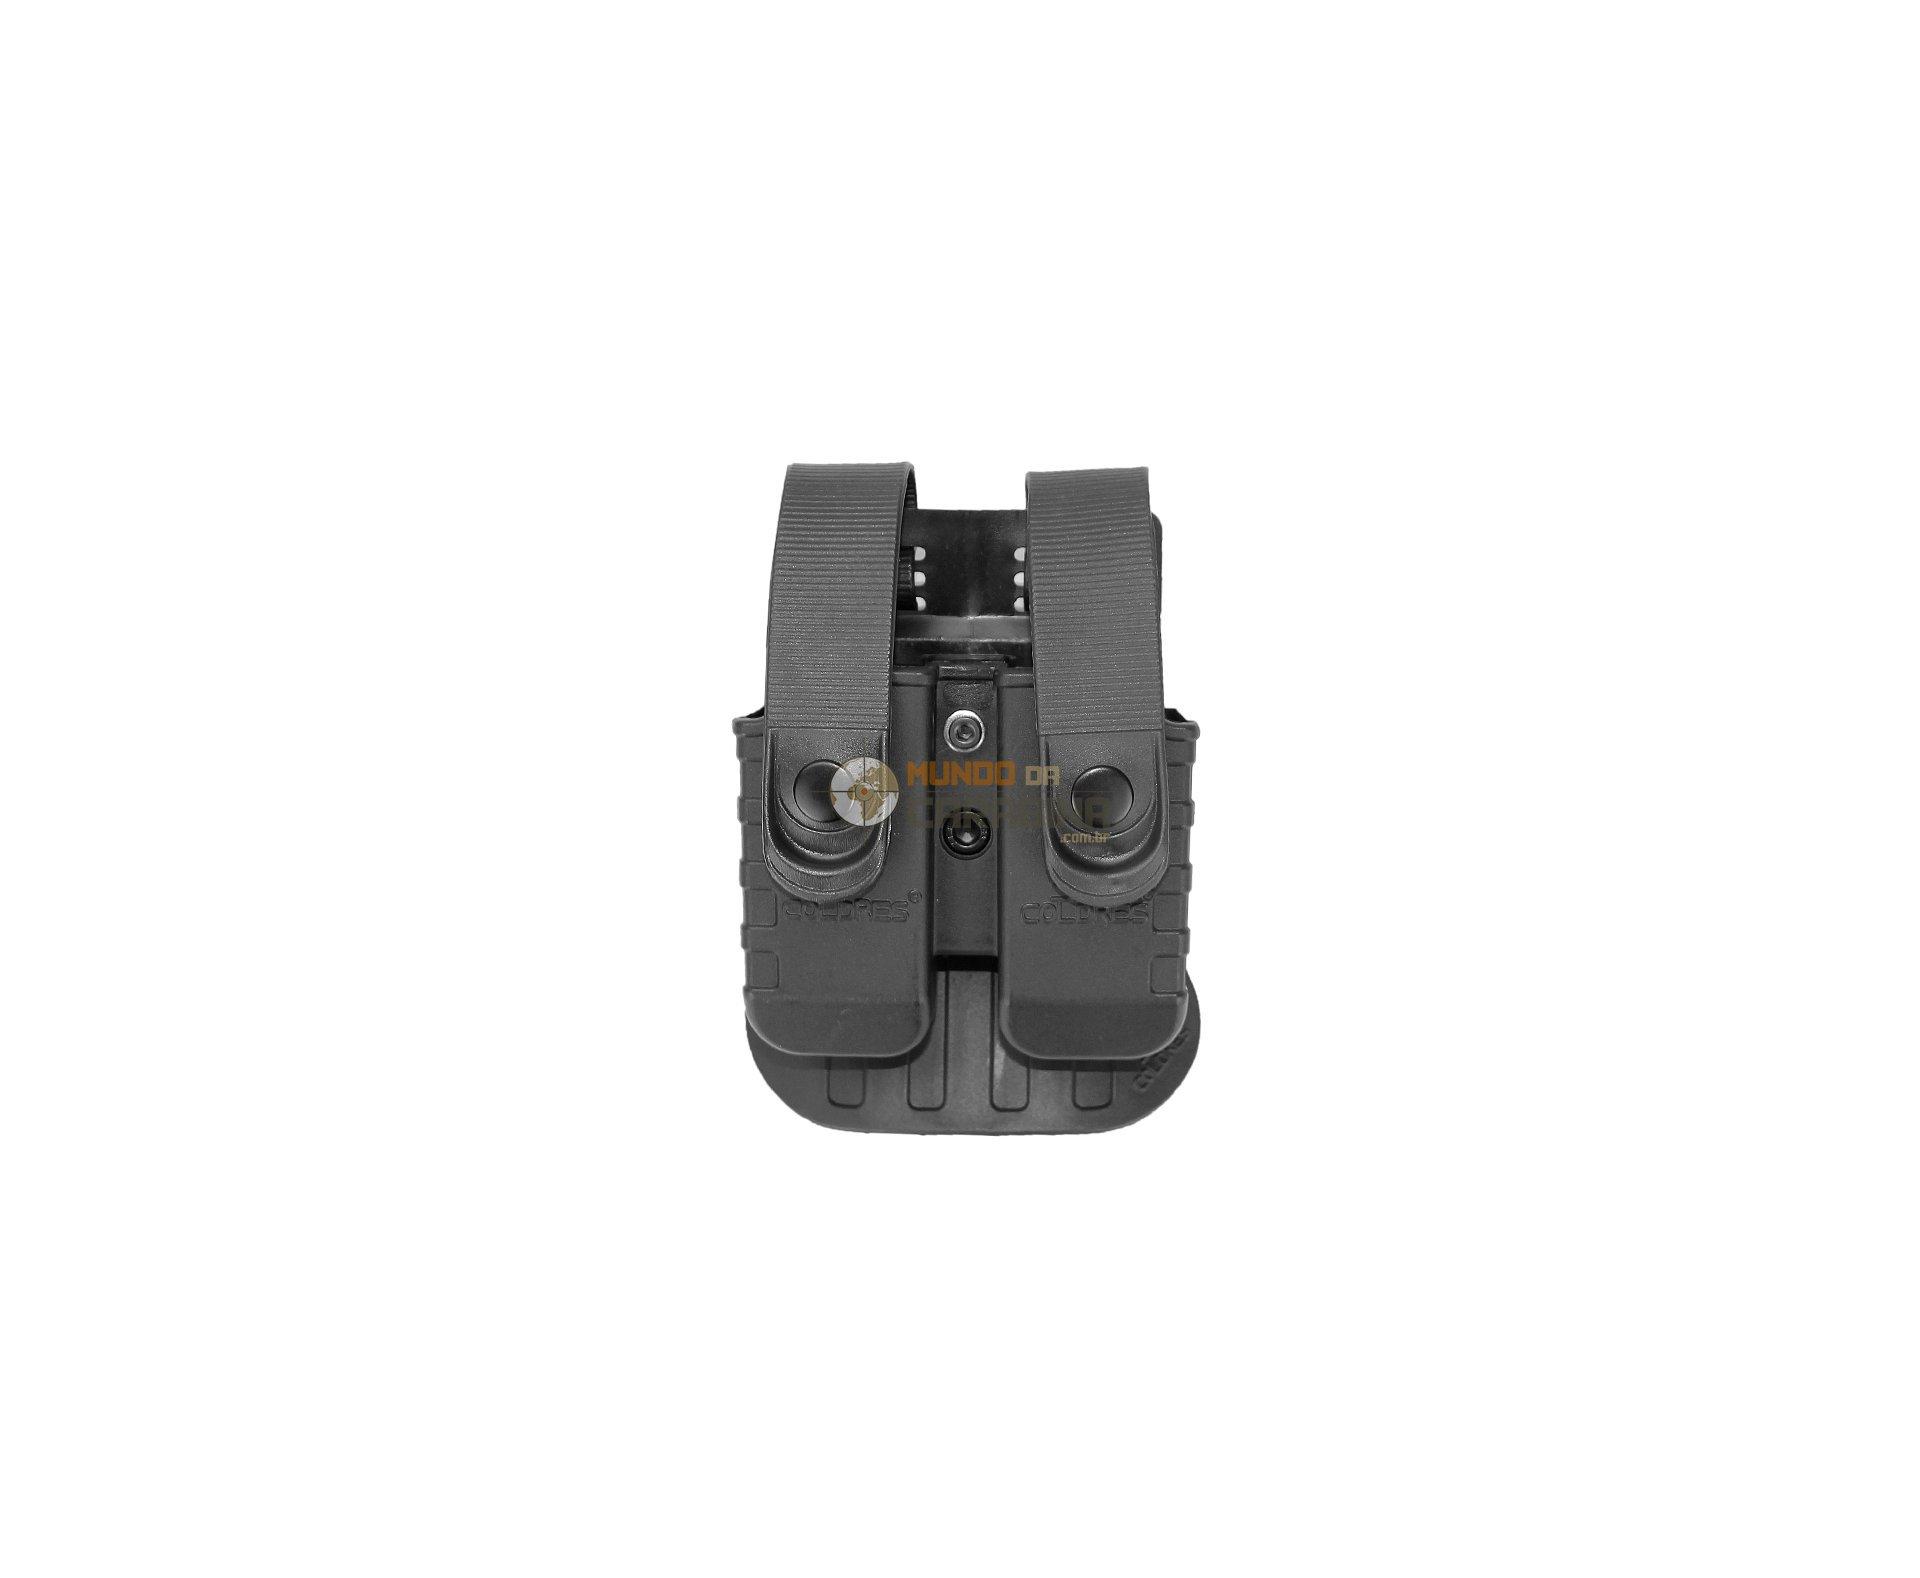 Porta Carregador Duplo Pistola Taurus, Imbel E Glock .40 - So Coldres